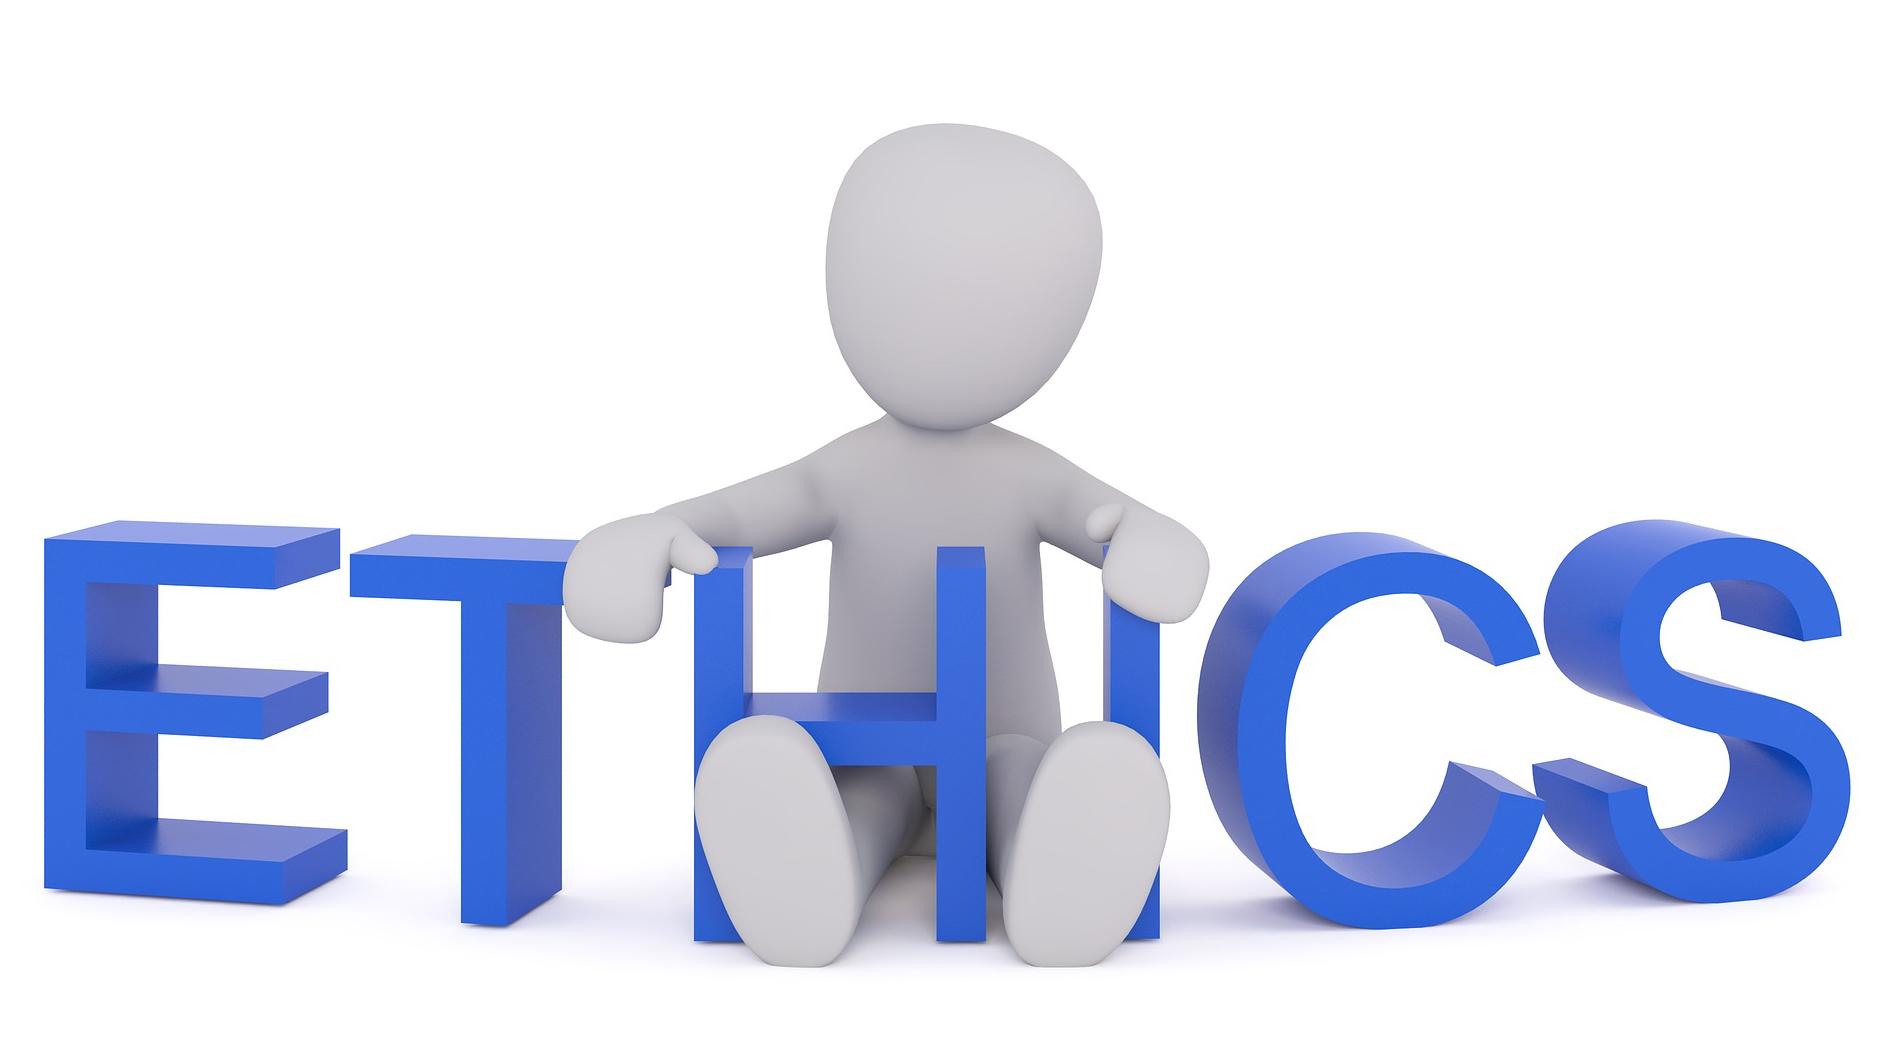 ethics-cropped-2110605_1920-edman_eu